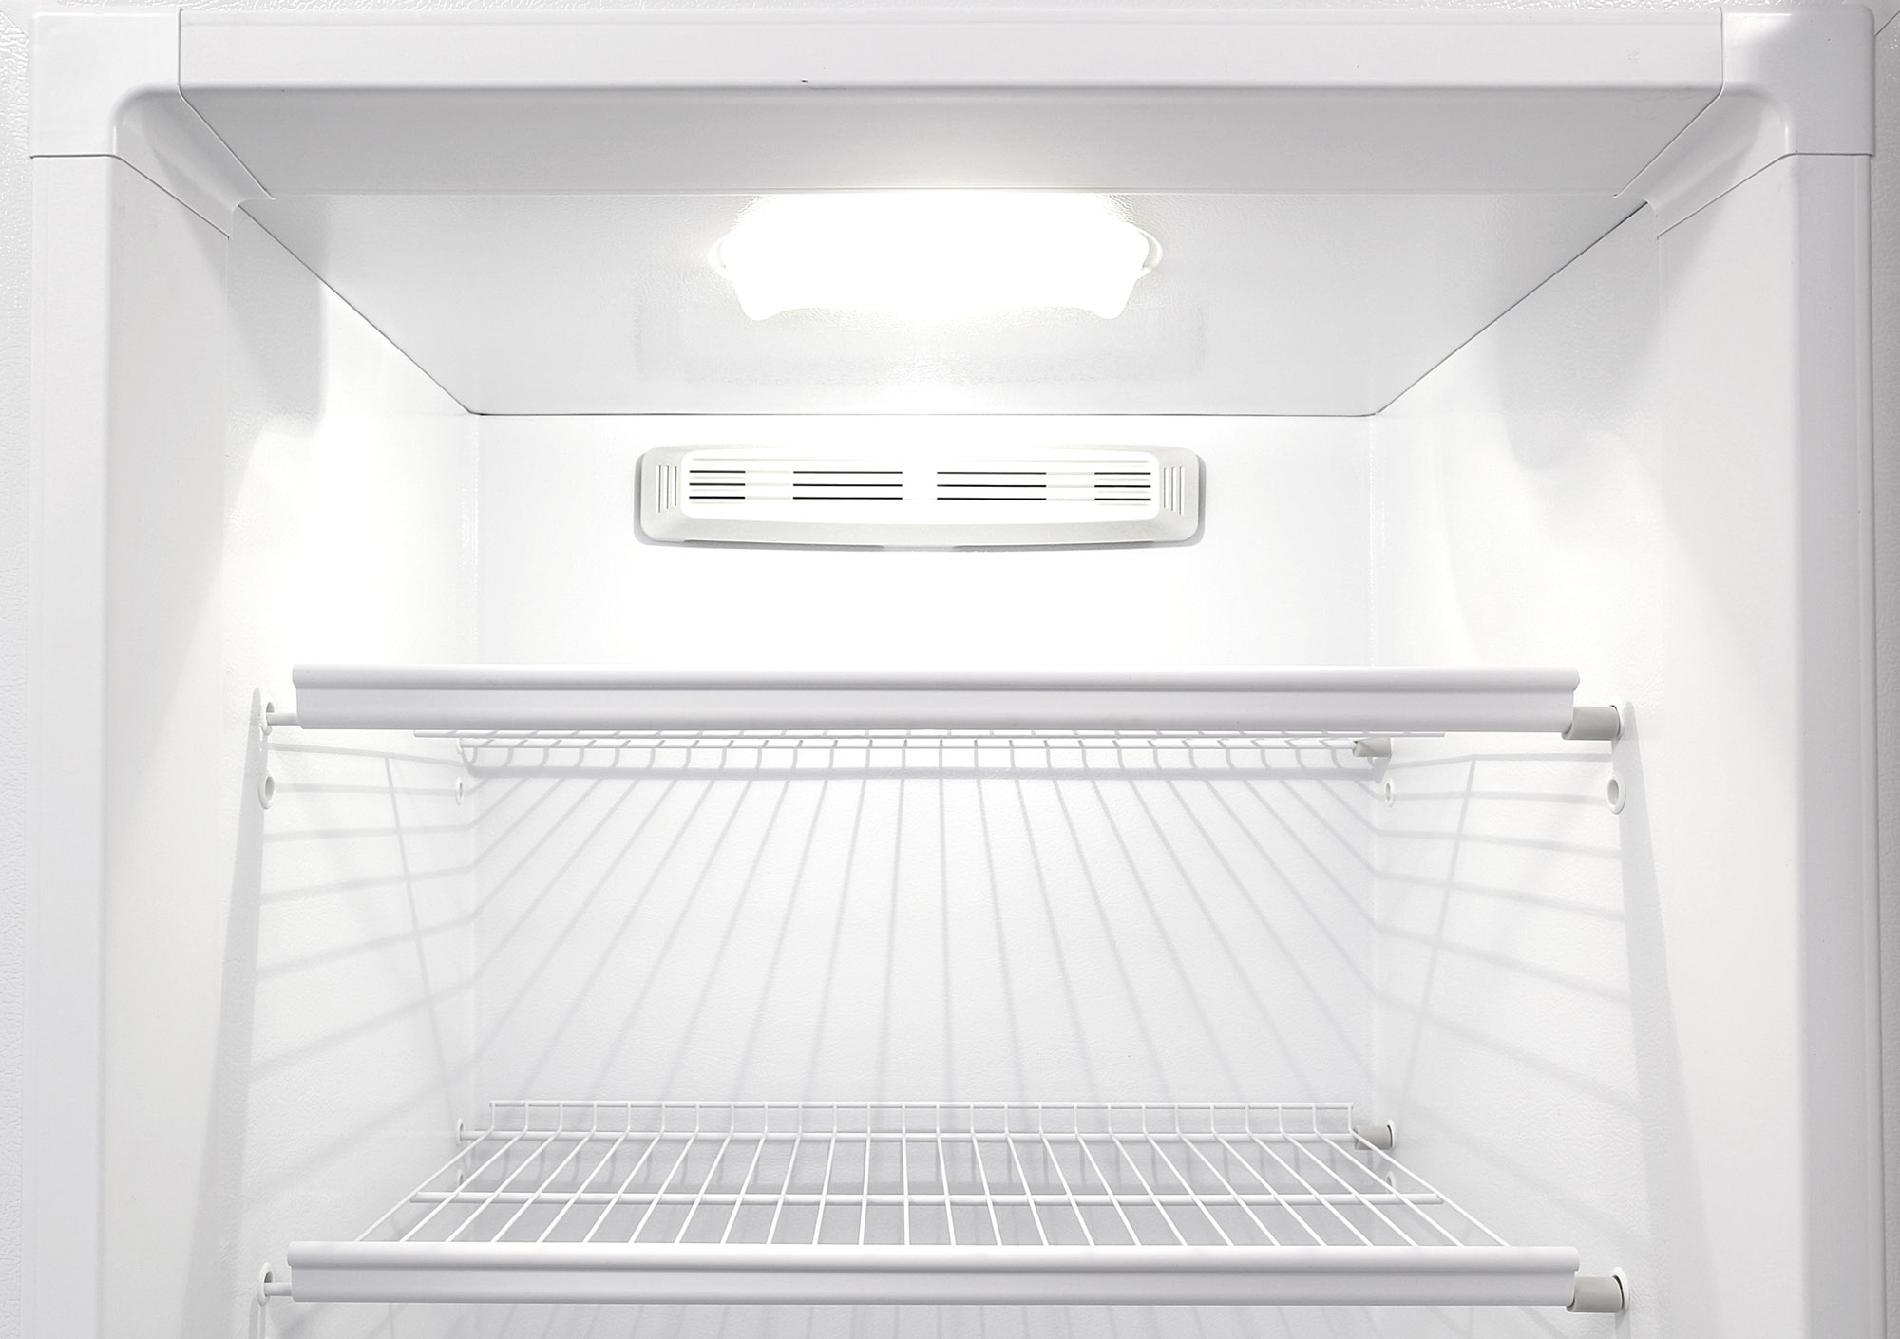 Kenmore 16.6 cu. ft. Upright Freezer - White